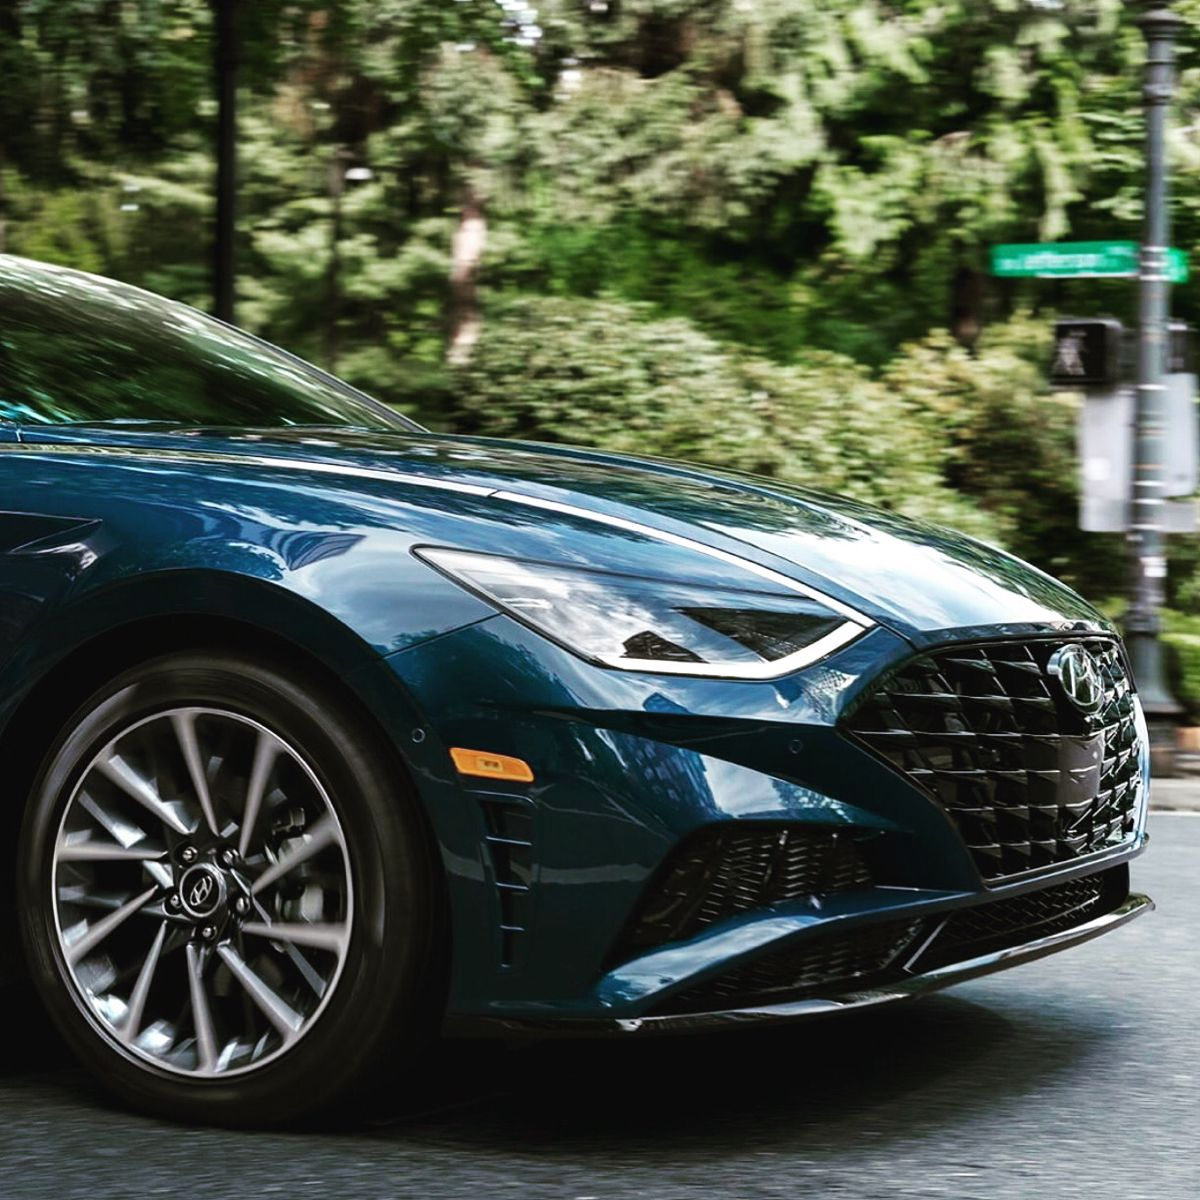 Pin on Spokane Hyundai & More